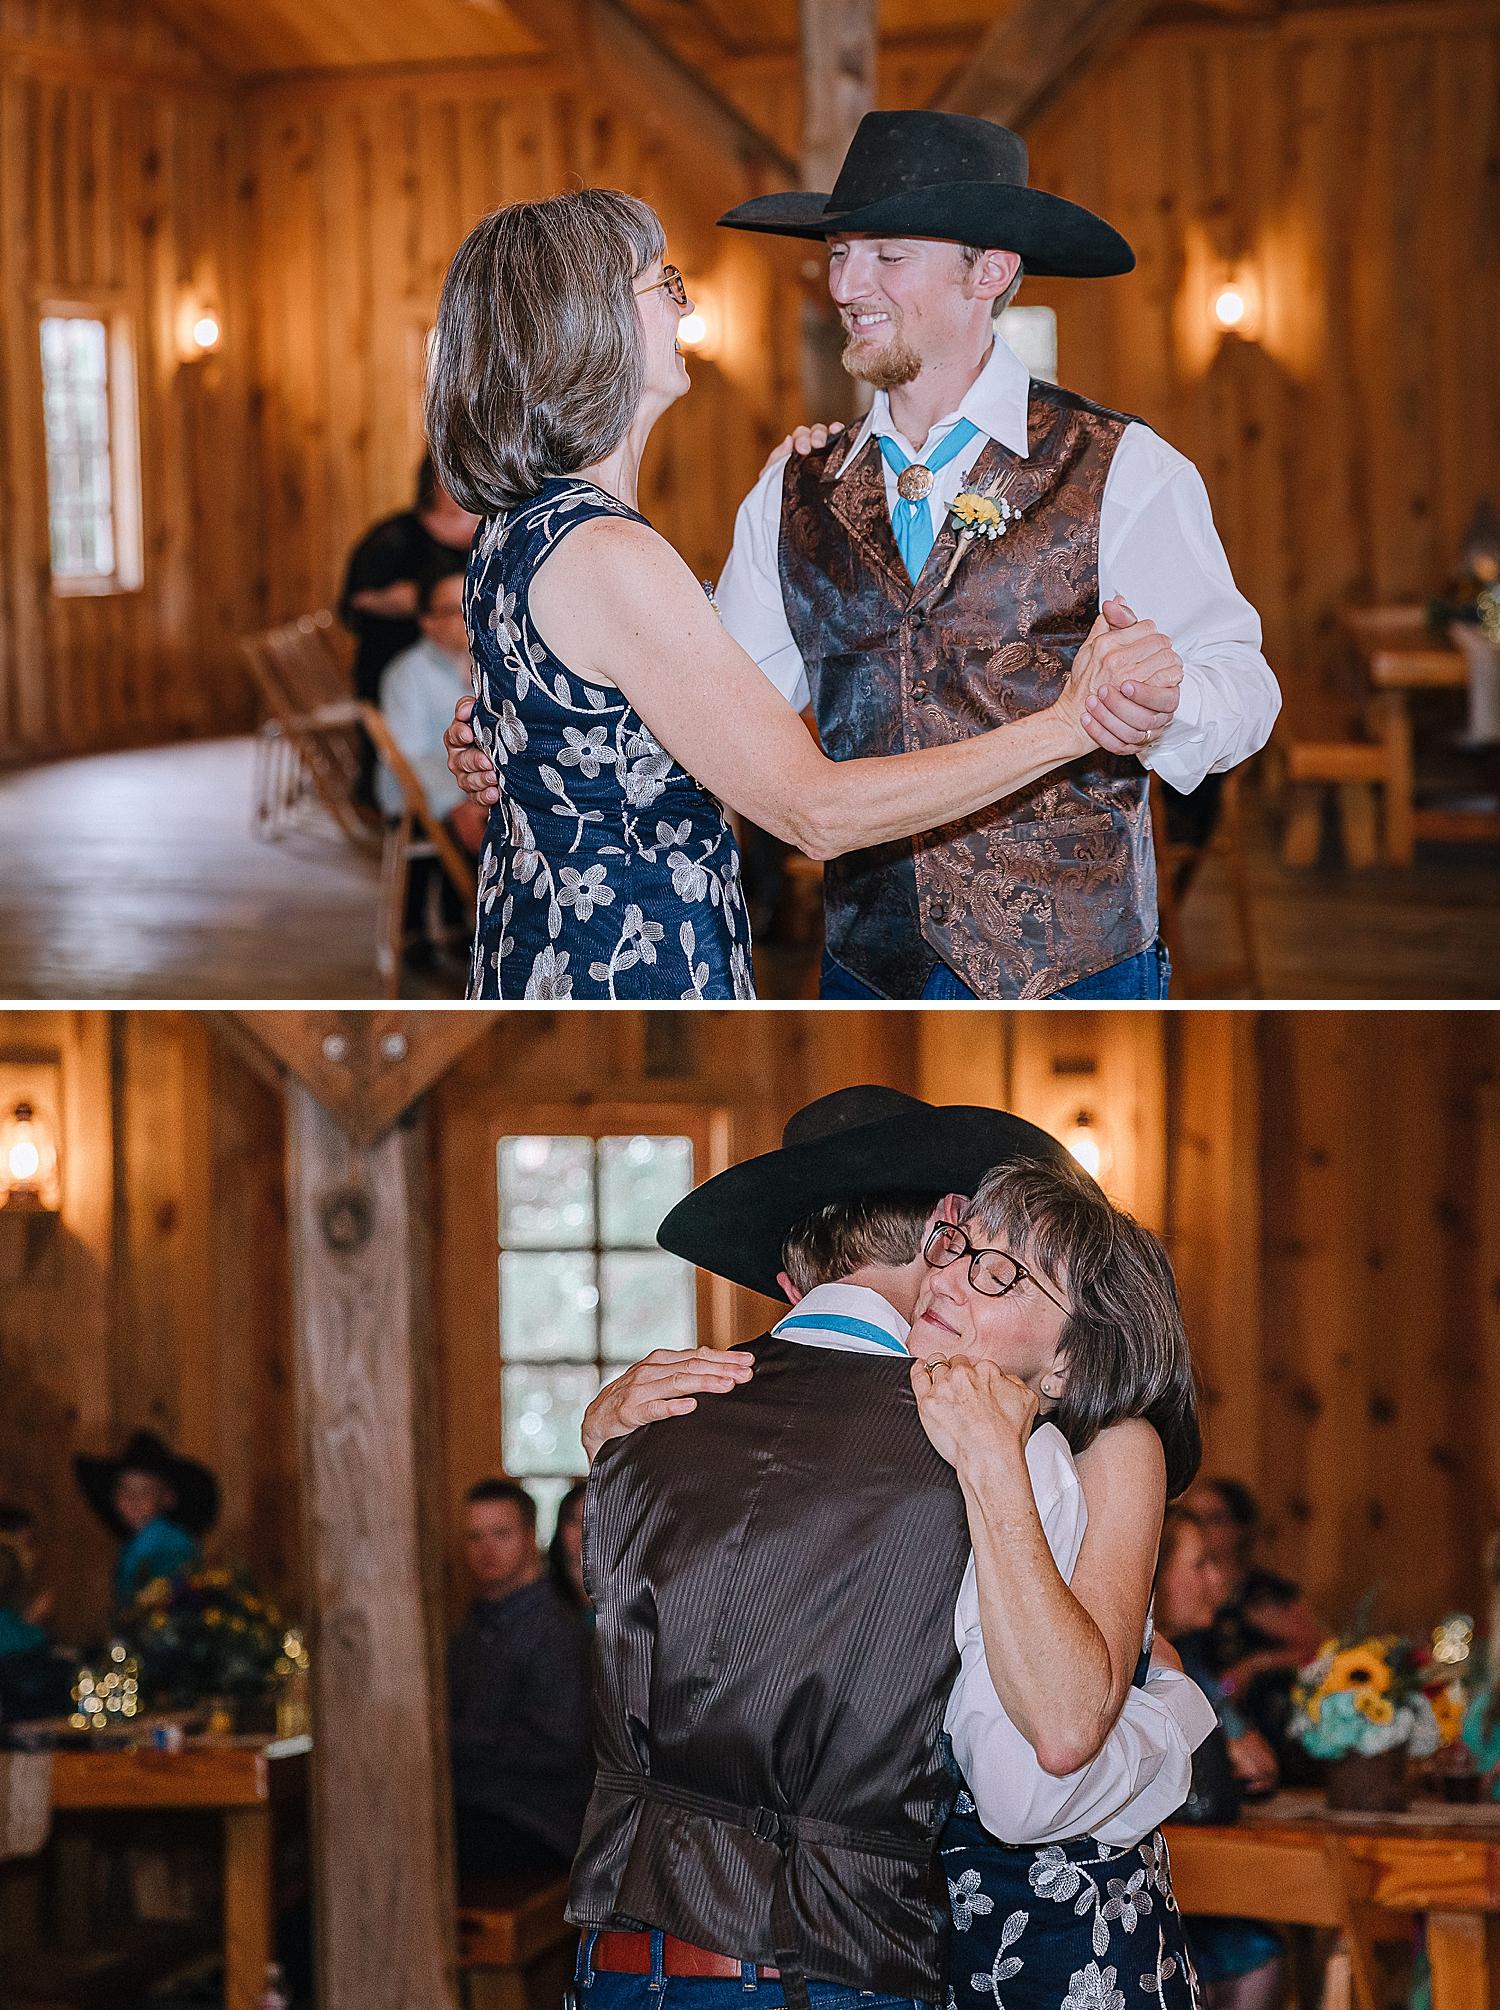 Carly-Barton-Photography-Old-Town-Texas-Rustic-Wedding-Photos-Sunflowers-Boots-Kyle-Texas_0113.jpg